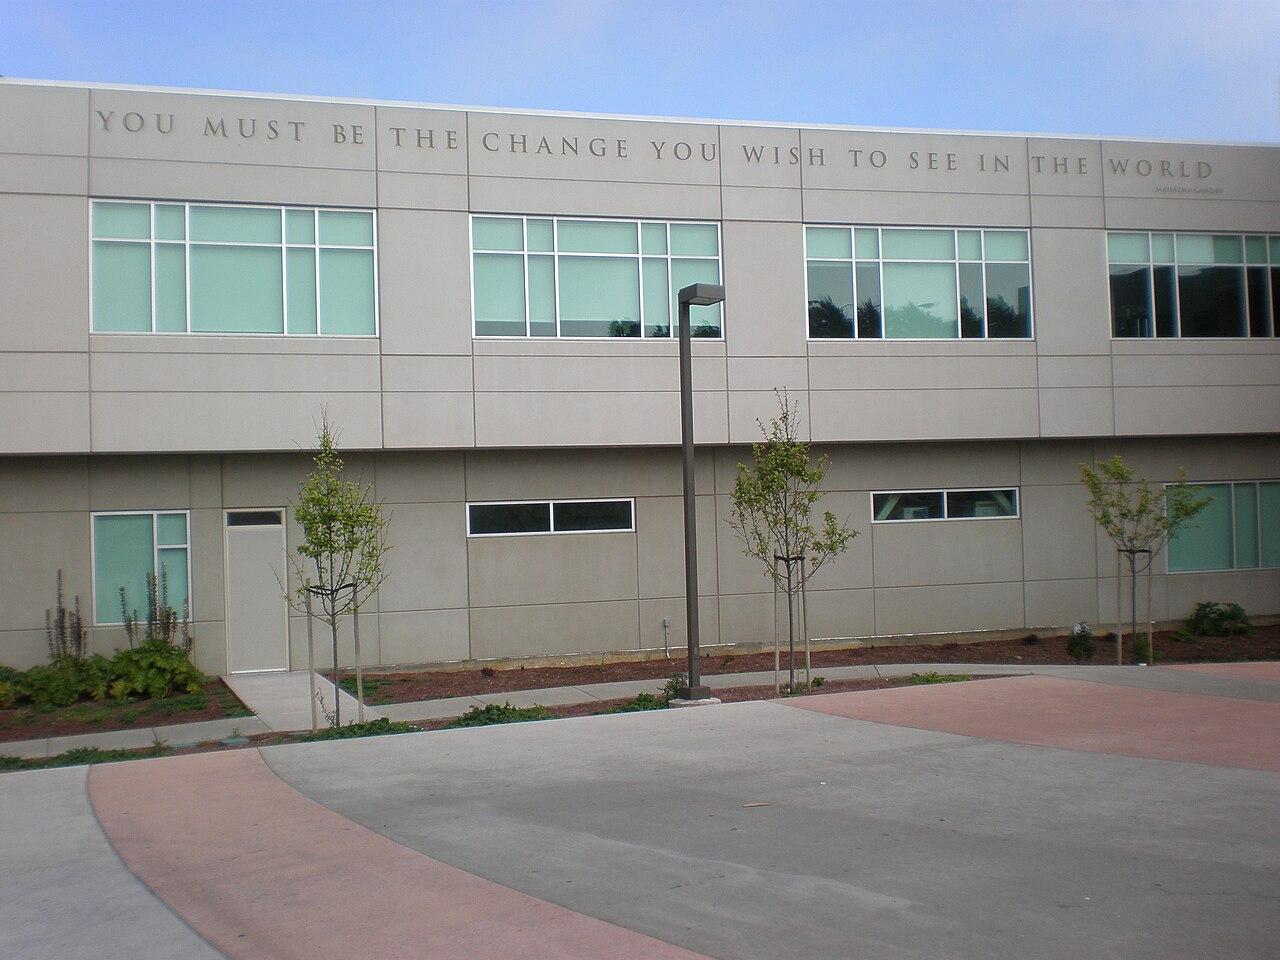 File:Skyline College Building 6 side 2.JPG - Wikimedia Commons